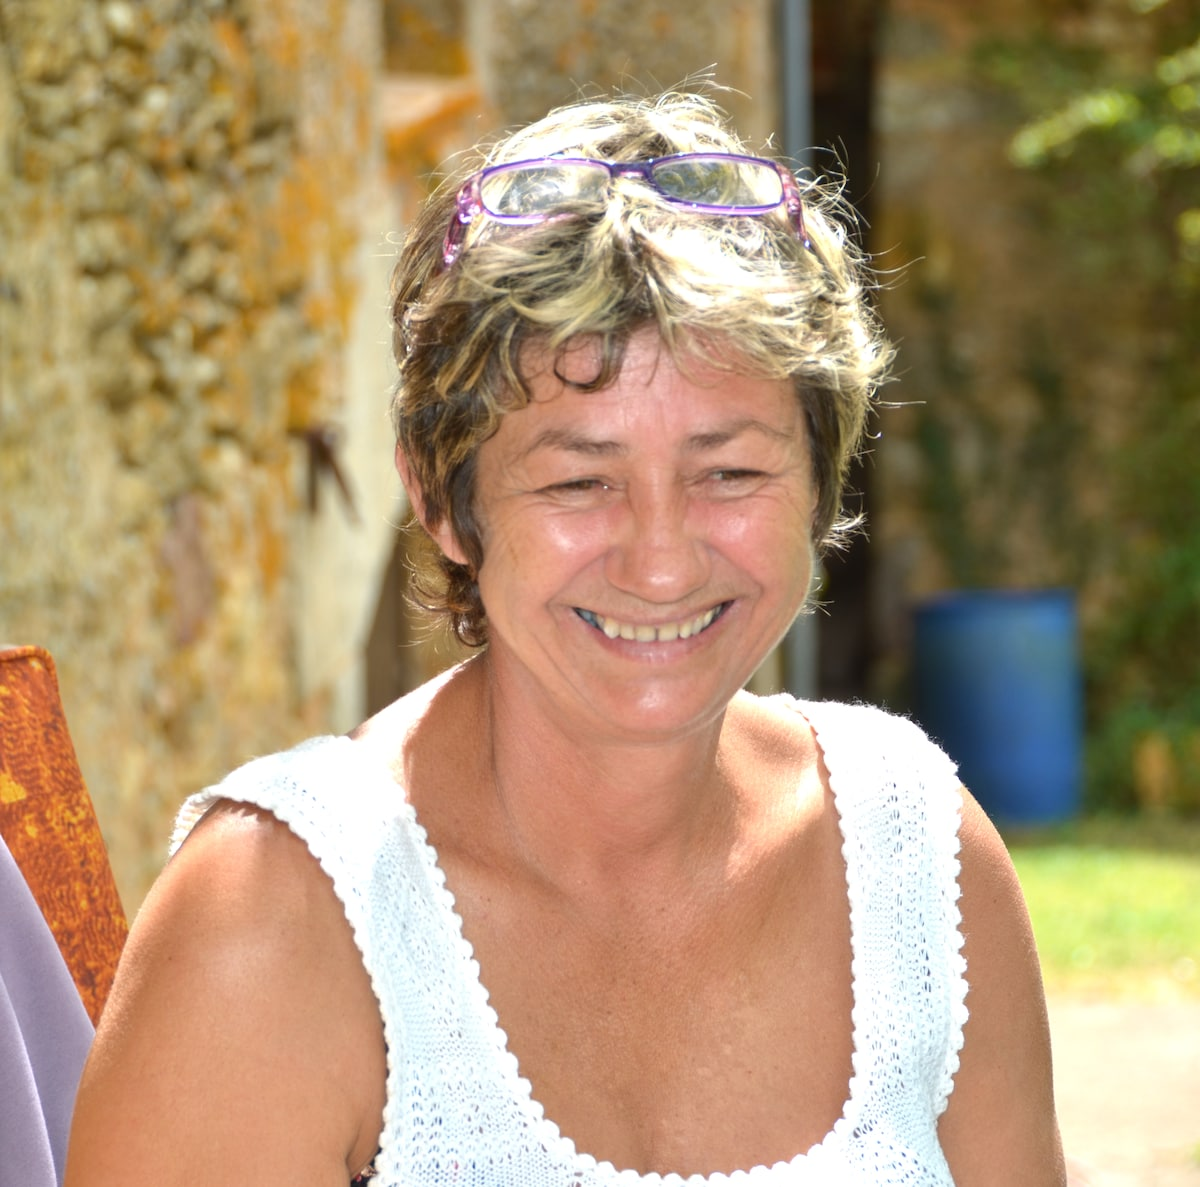 Hélène from Agde